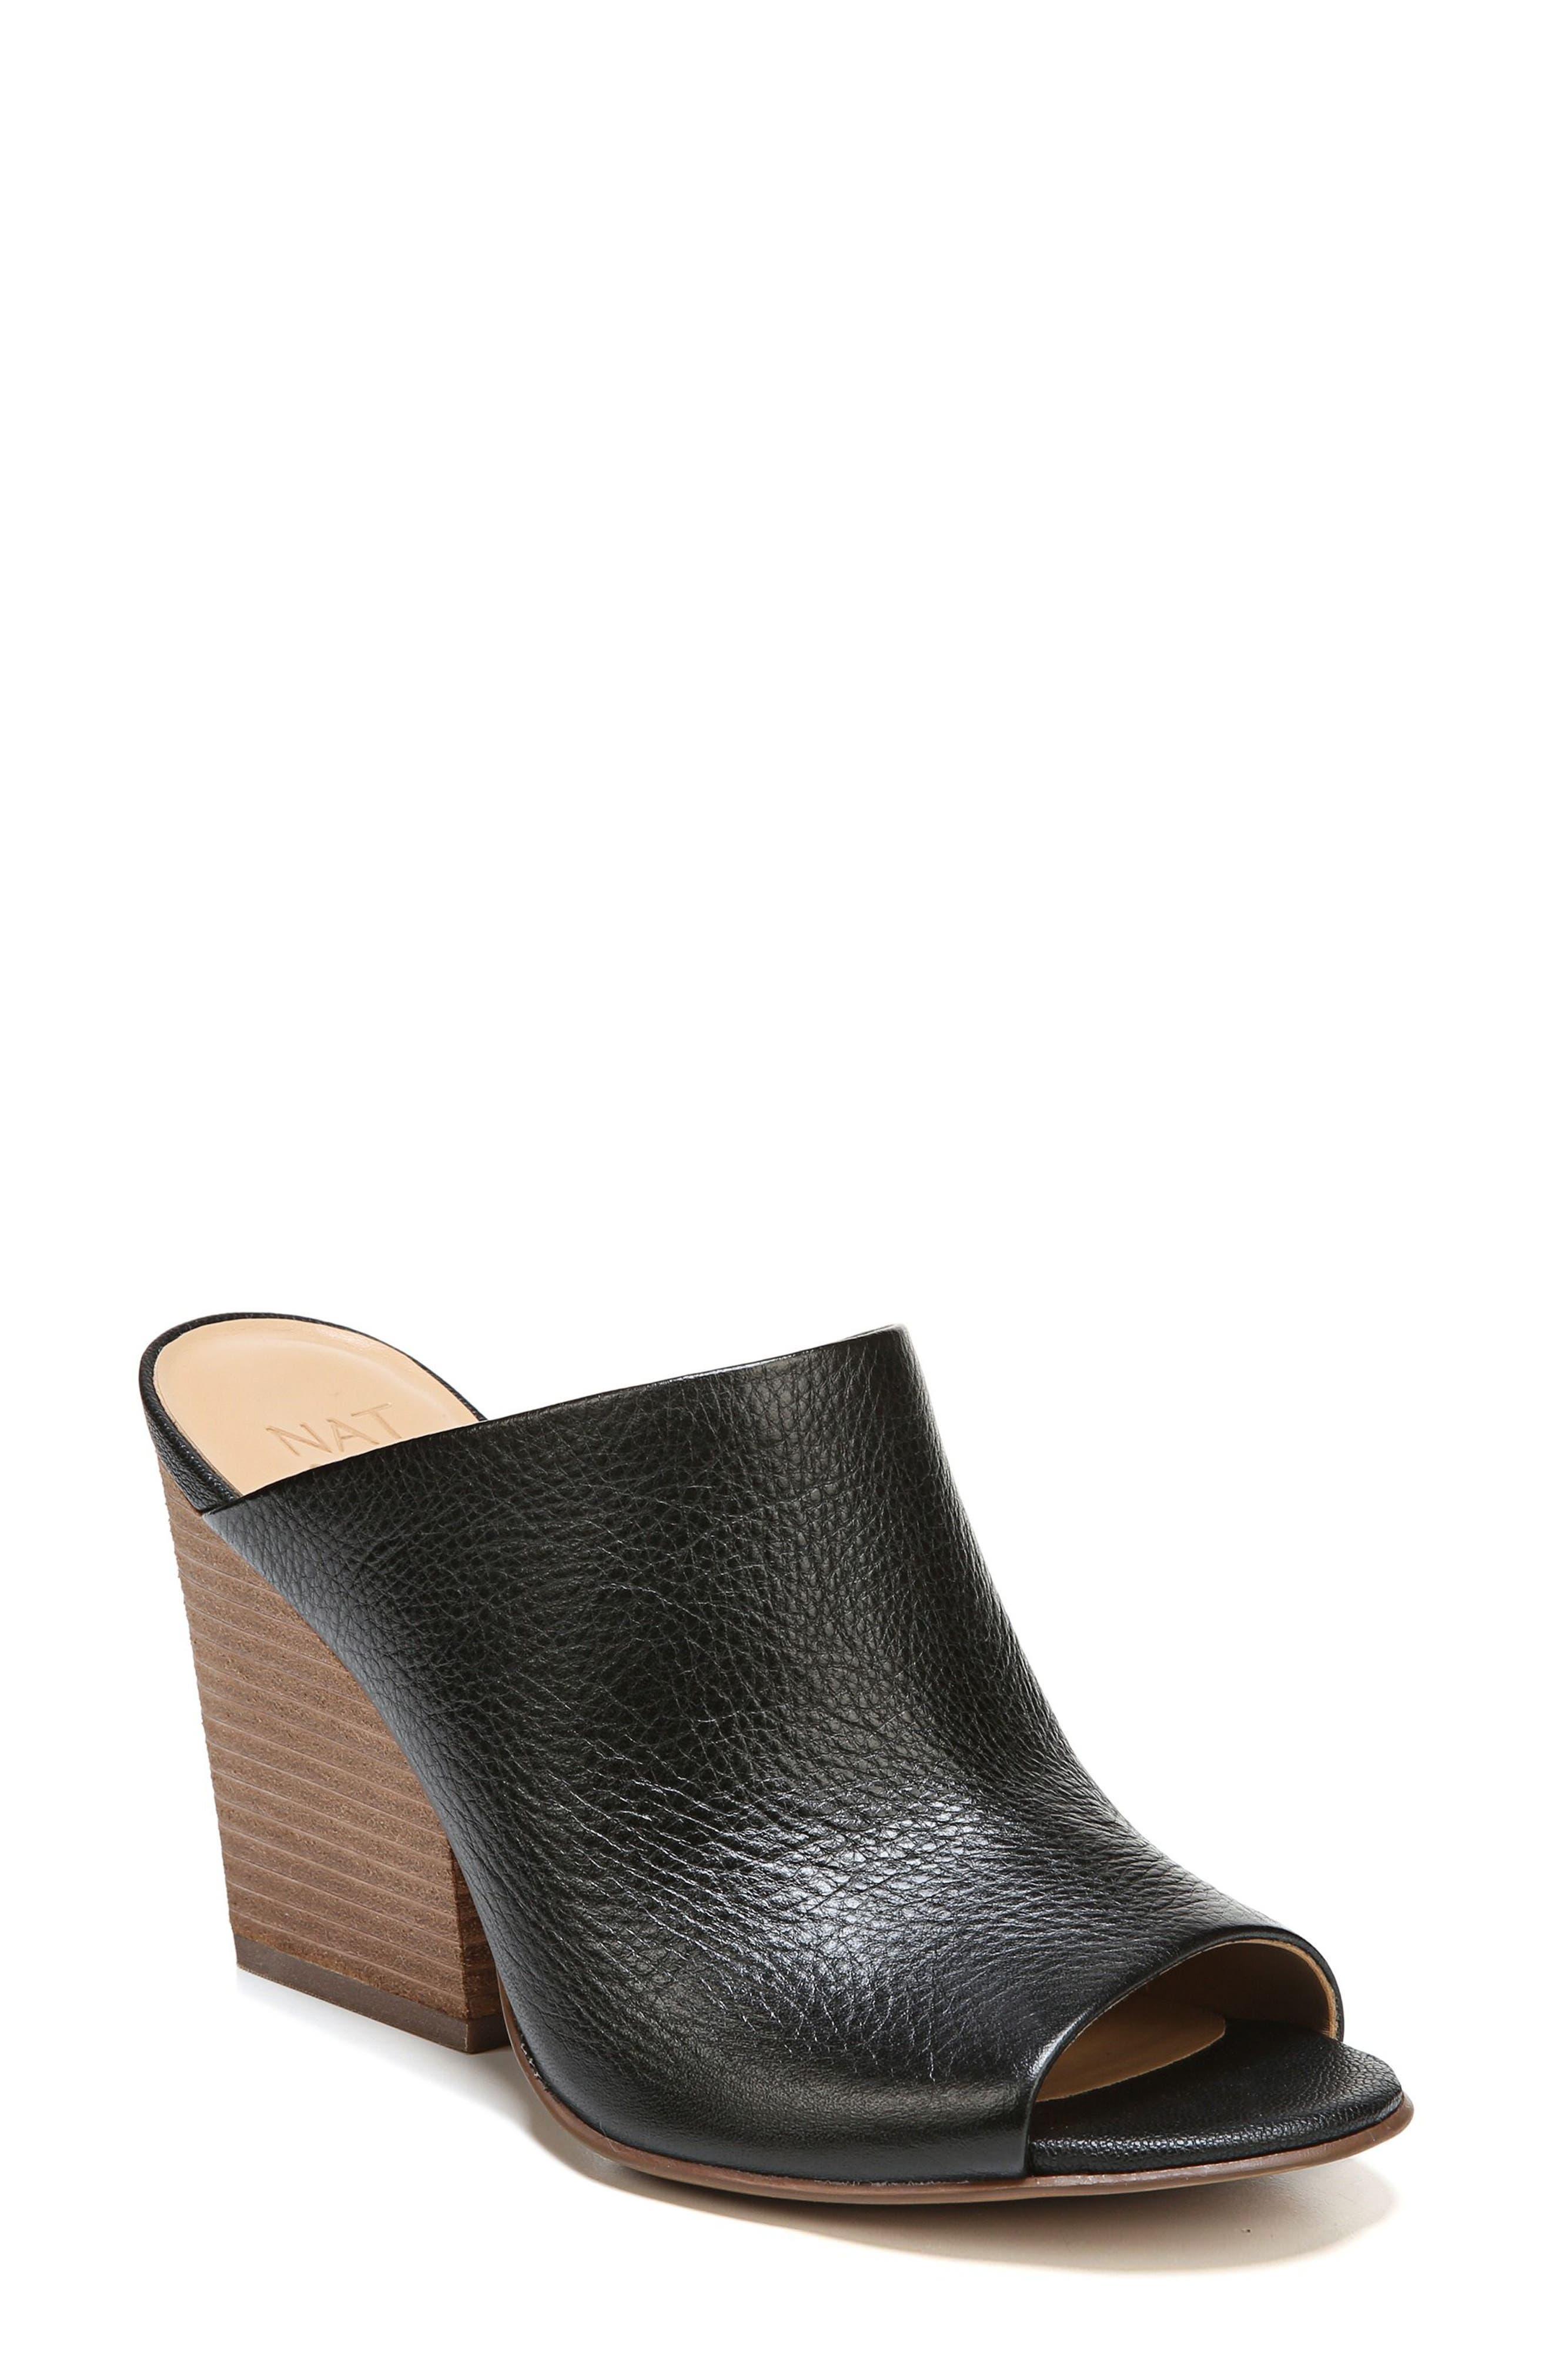 Sloan Sandal,                             Main thumbnail 1, color,                             Black Pebbled Leather